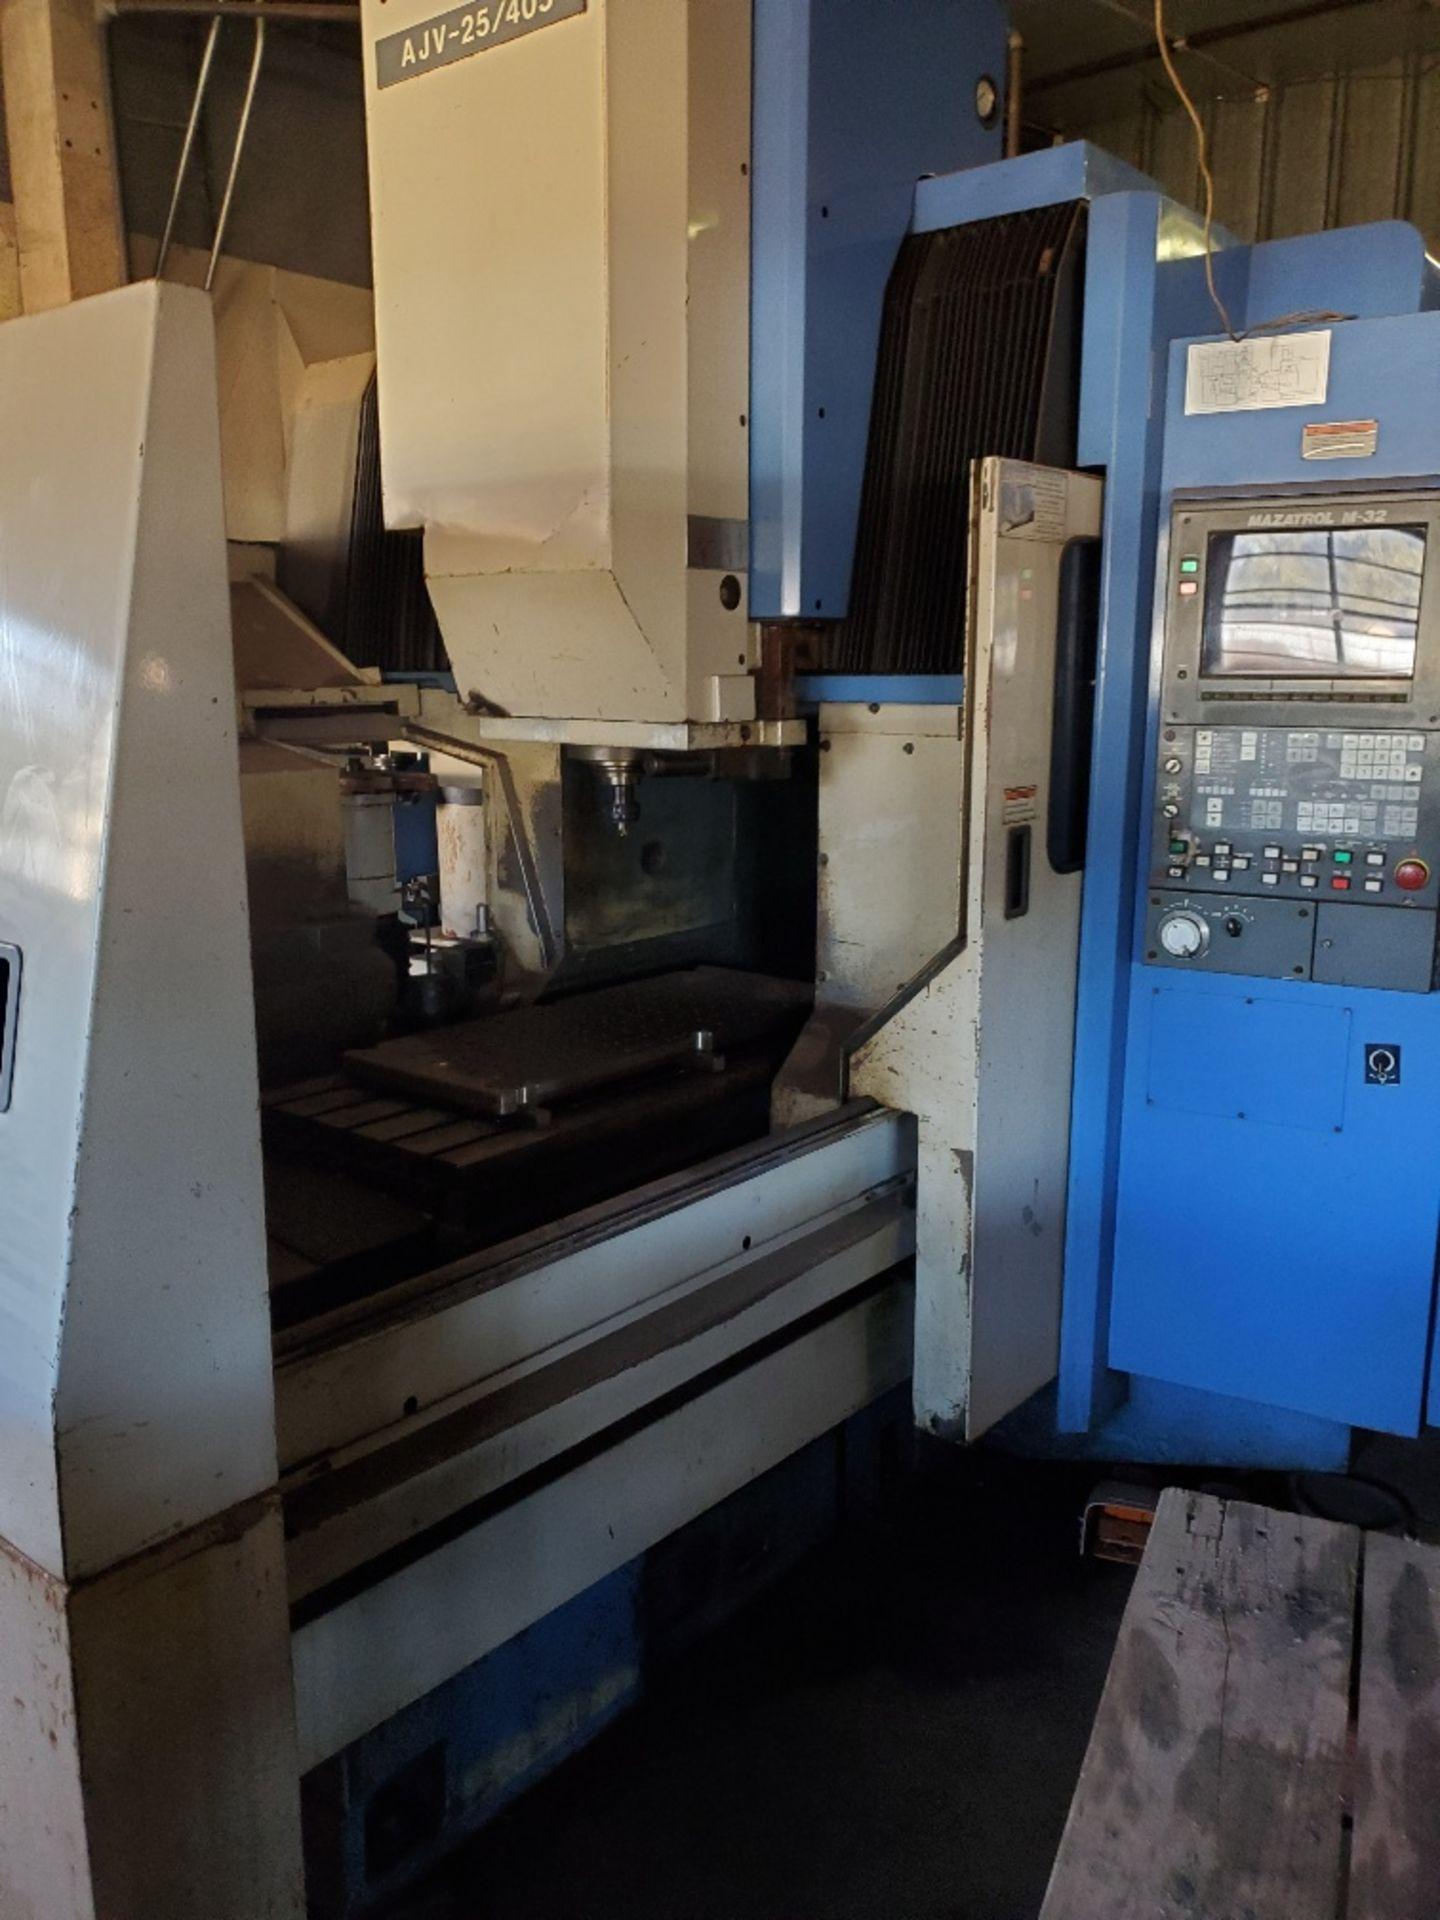 MAZAK AJV 25-405 MACHINING CENTER W/ MAZATROL M-32 CTRL (LOCATION: 5702 W 7TH ST, WAKE VILLLAGE, TX